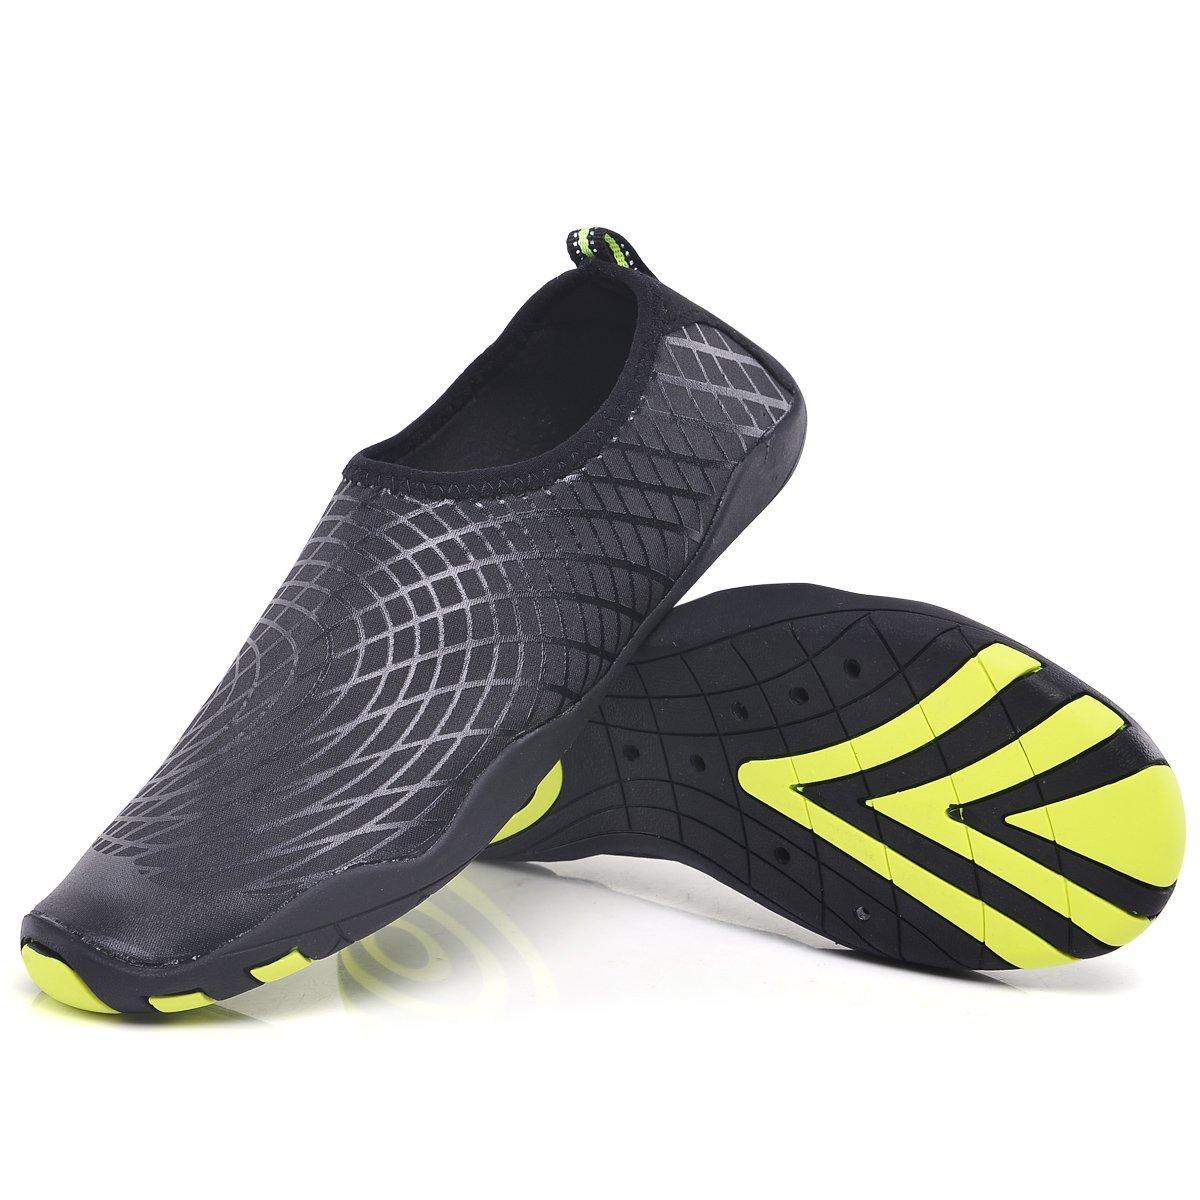 Mens Water Shoes Quick Dry Slip On Beach Swim Shoes Sports Lightweight Aqua Socks Shoe(Black 44)